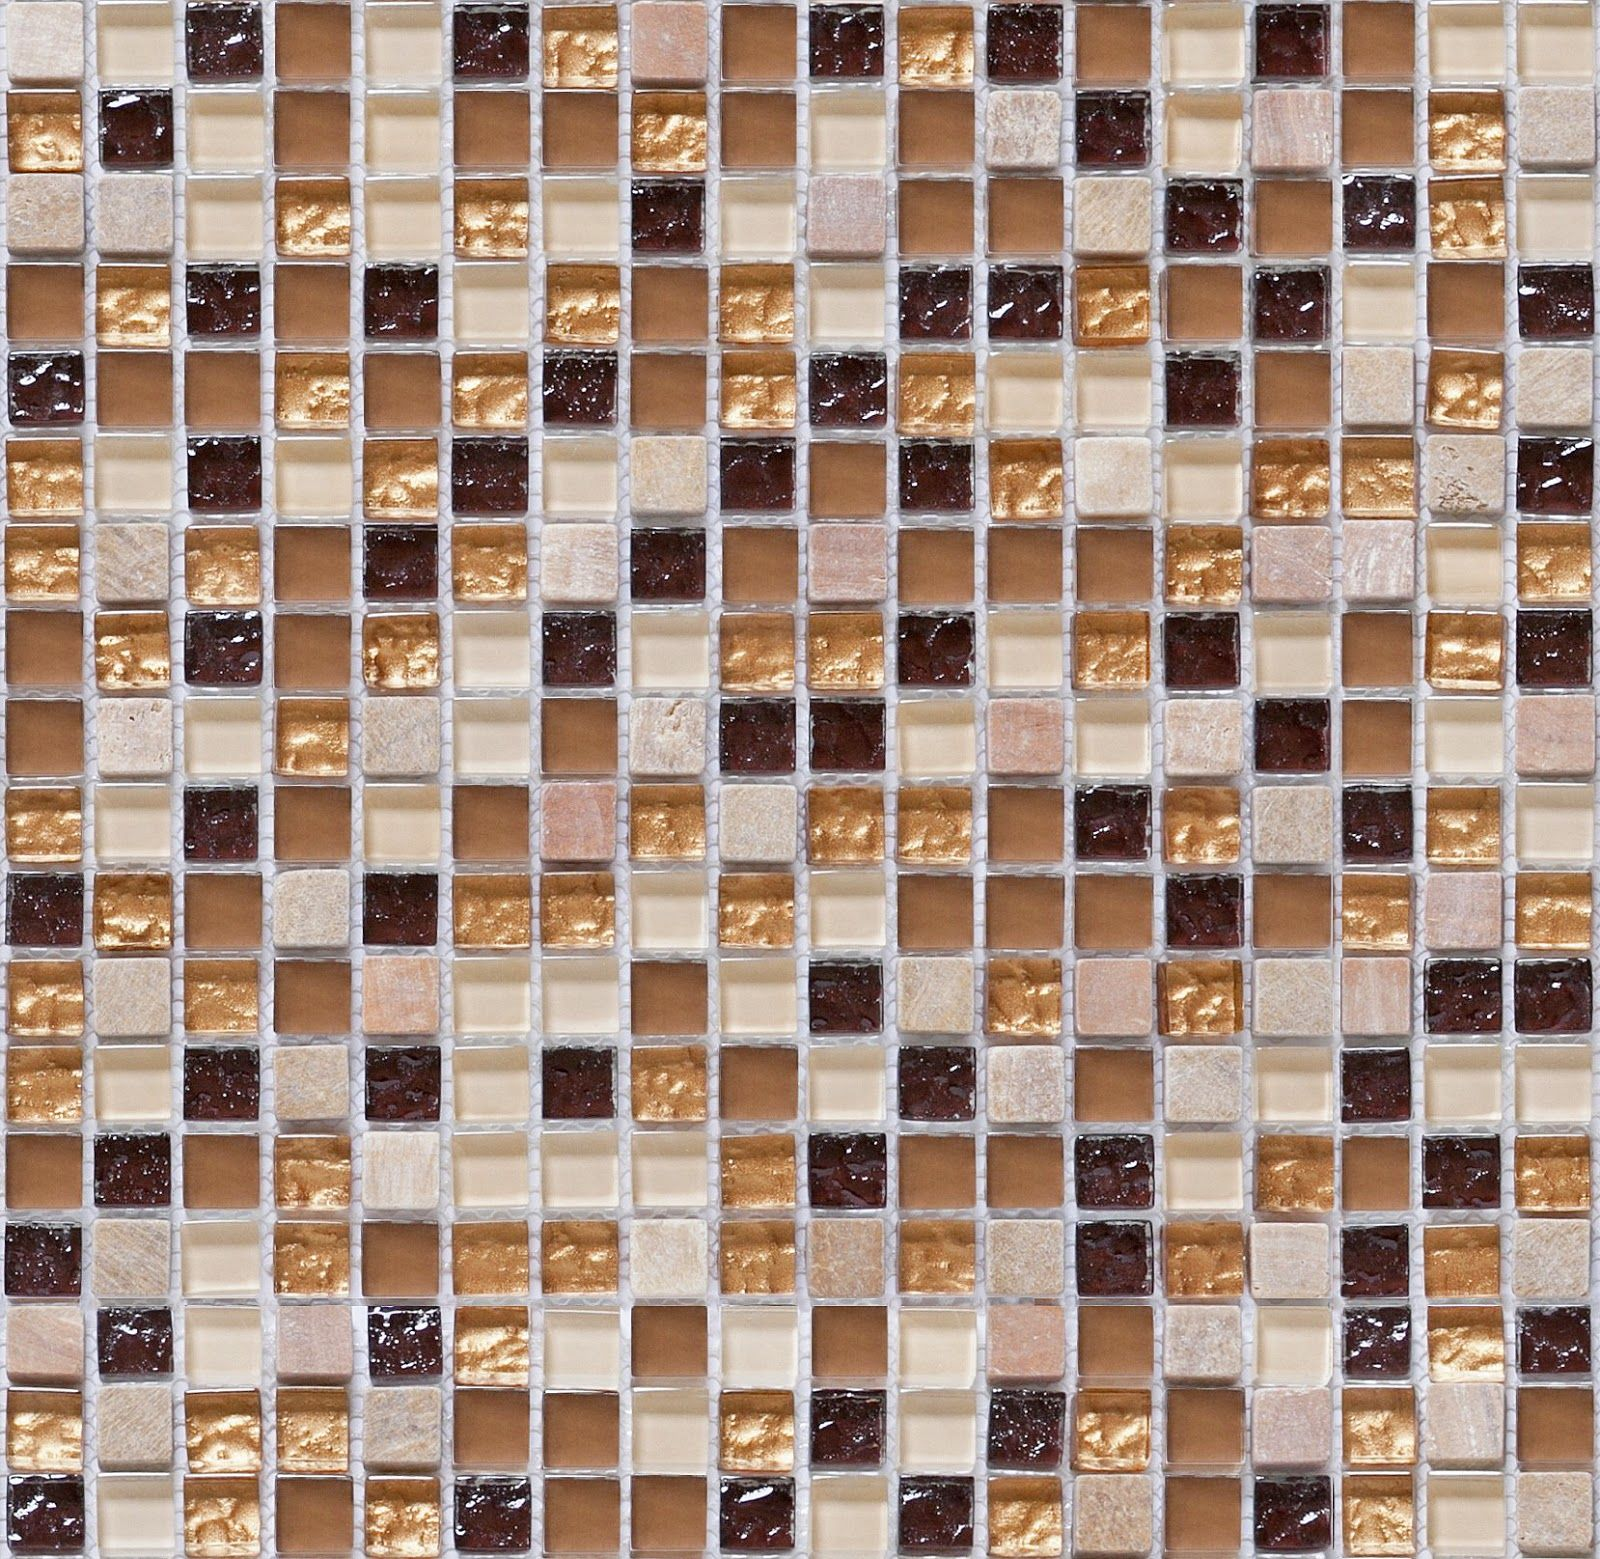 Seamless Mosaic Tiles Texture + (Maps) | texturise | texturi ...